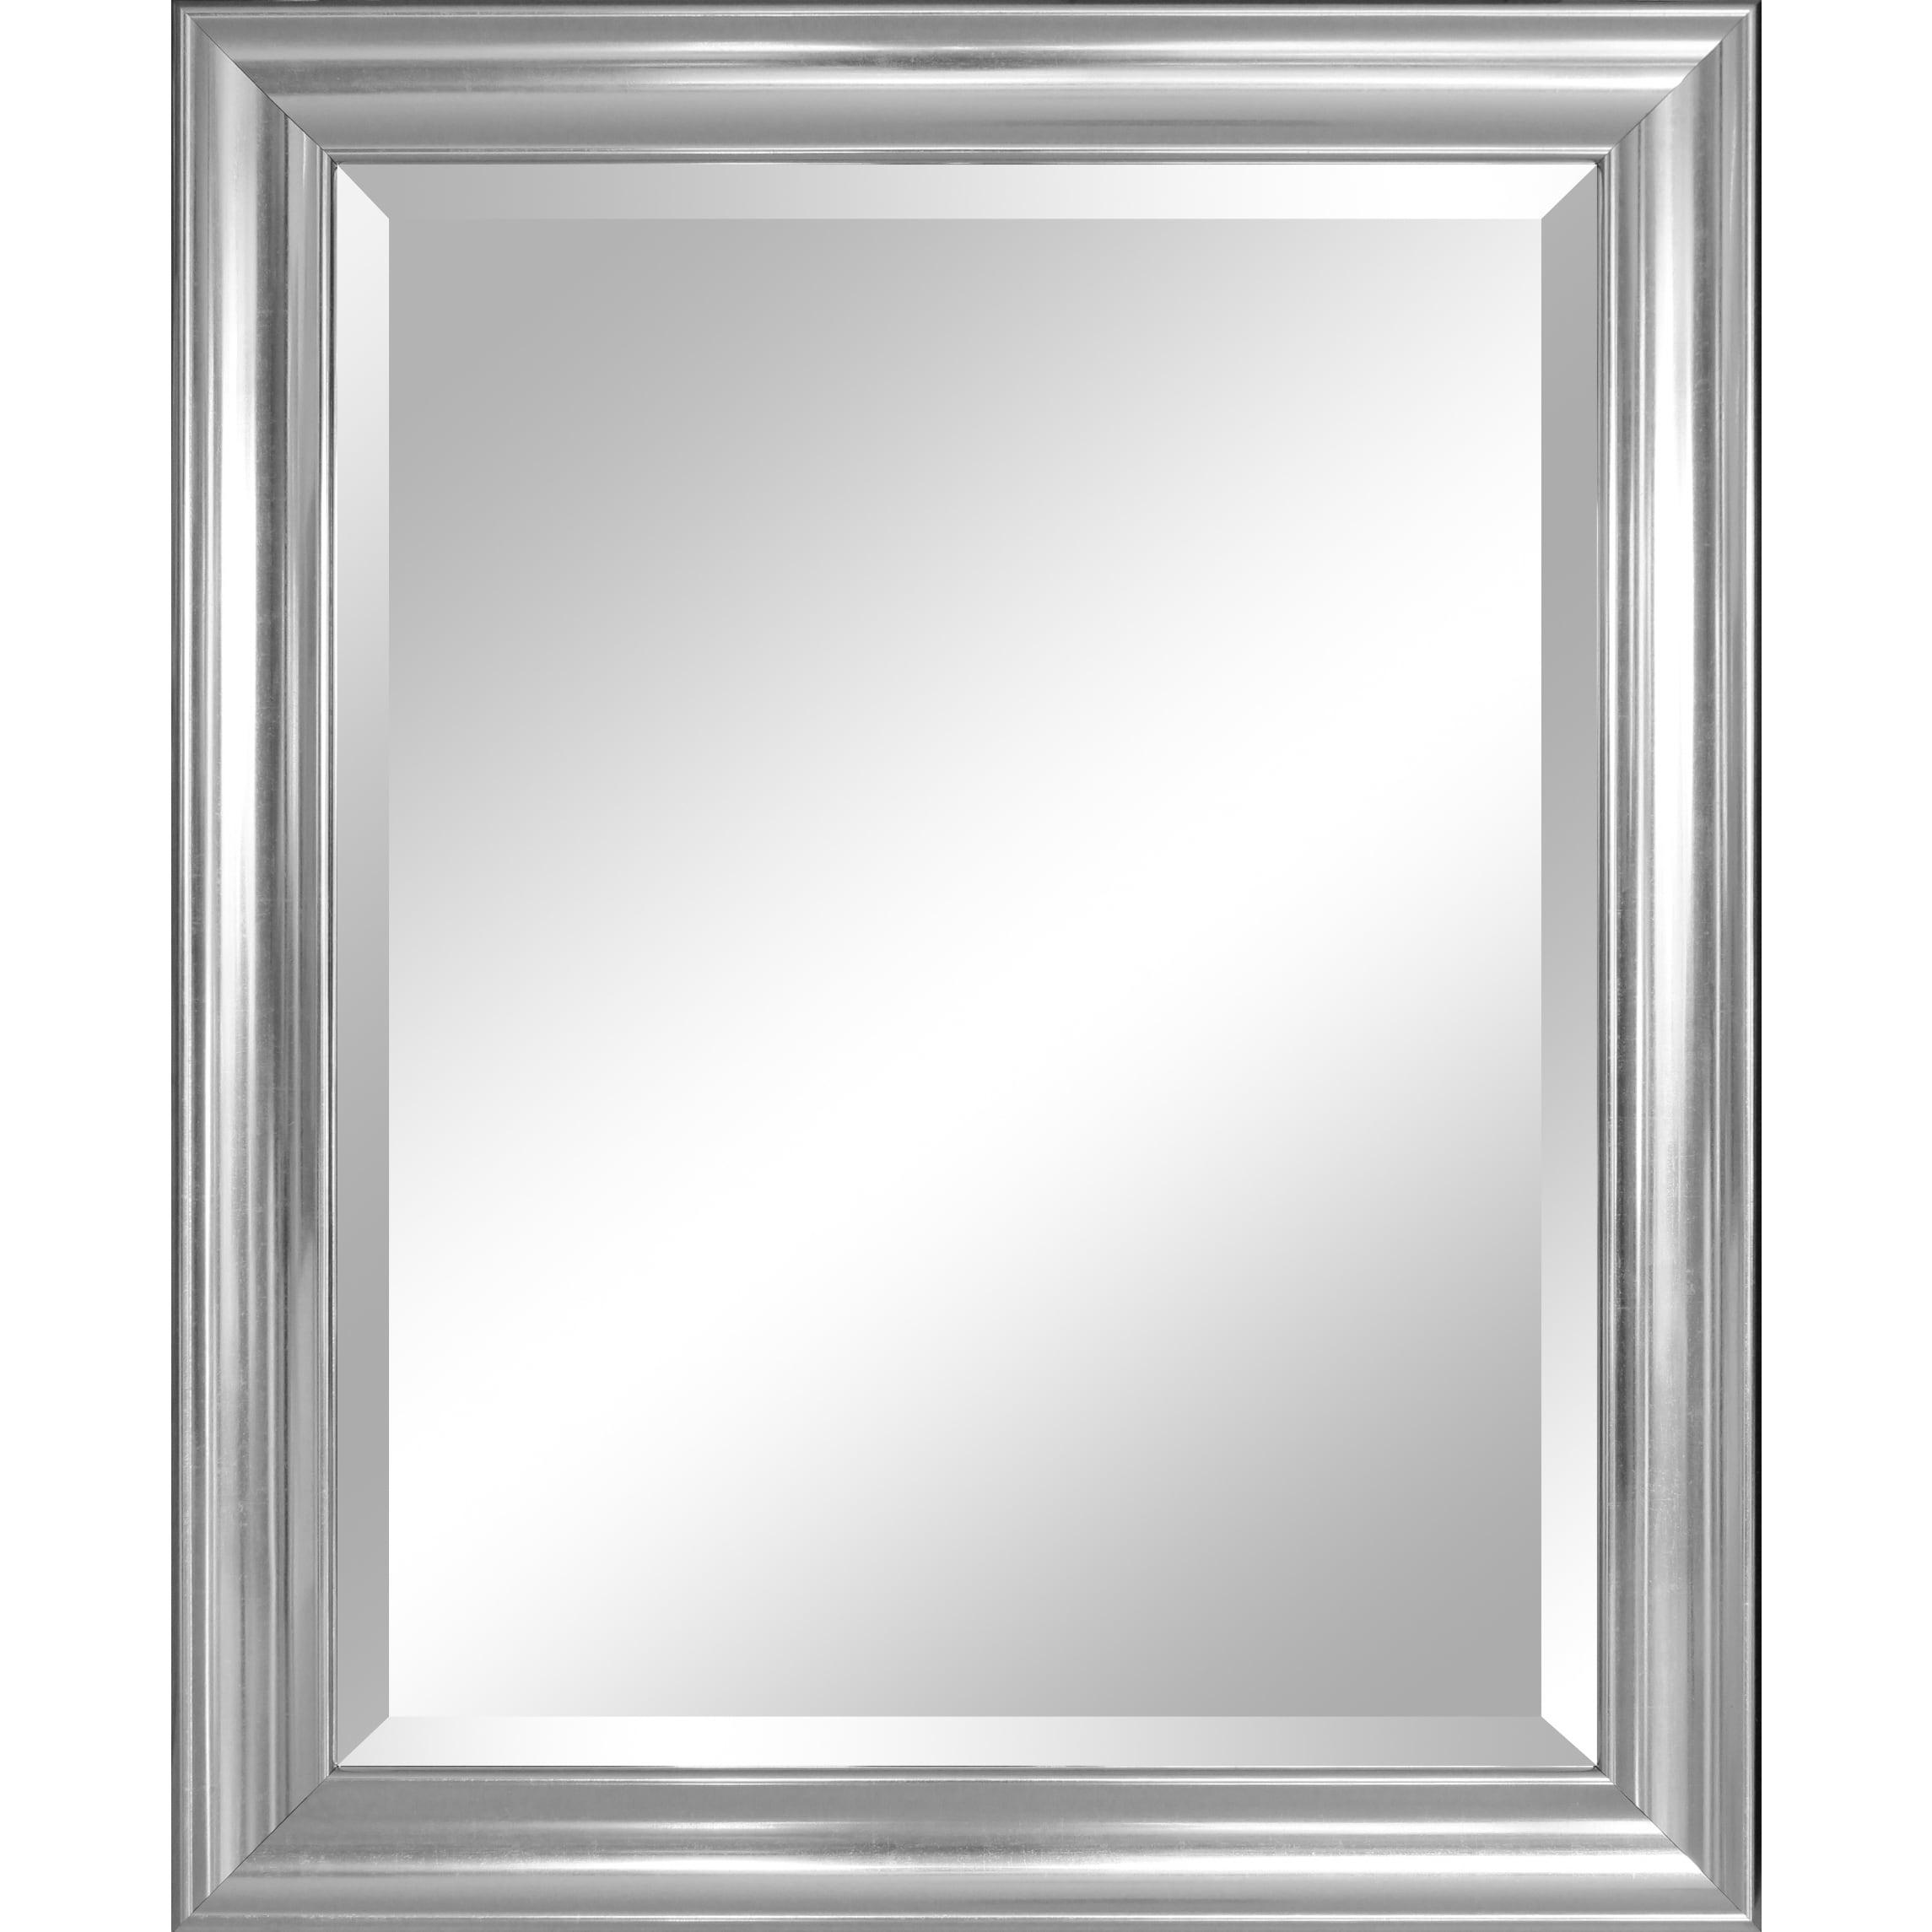 Shop Crackled Silver Bevelled Glass 28-inch x 34-inch Framed Mirror ...